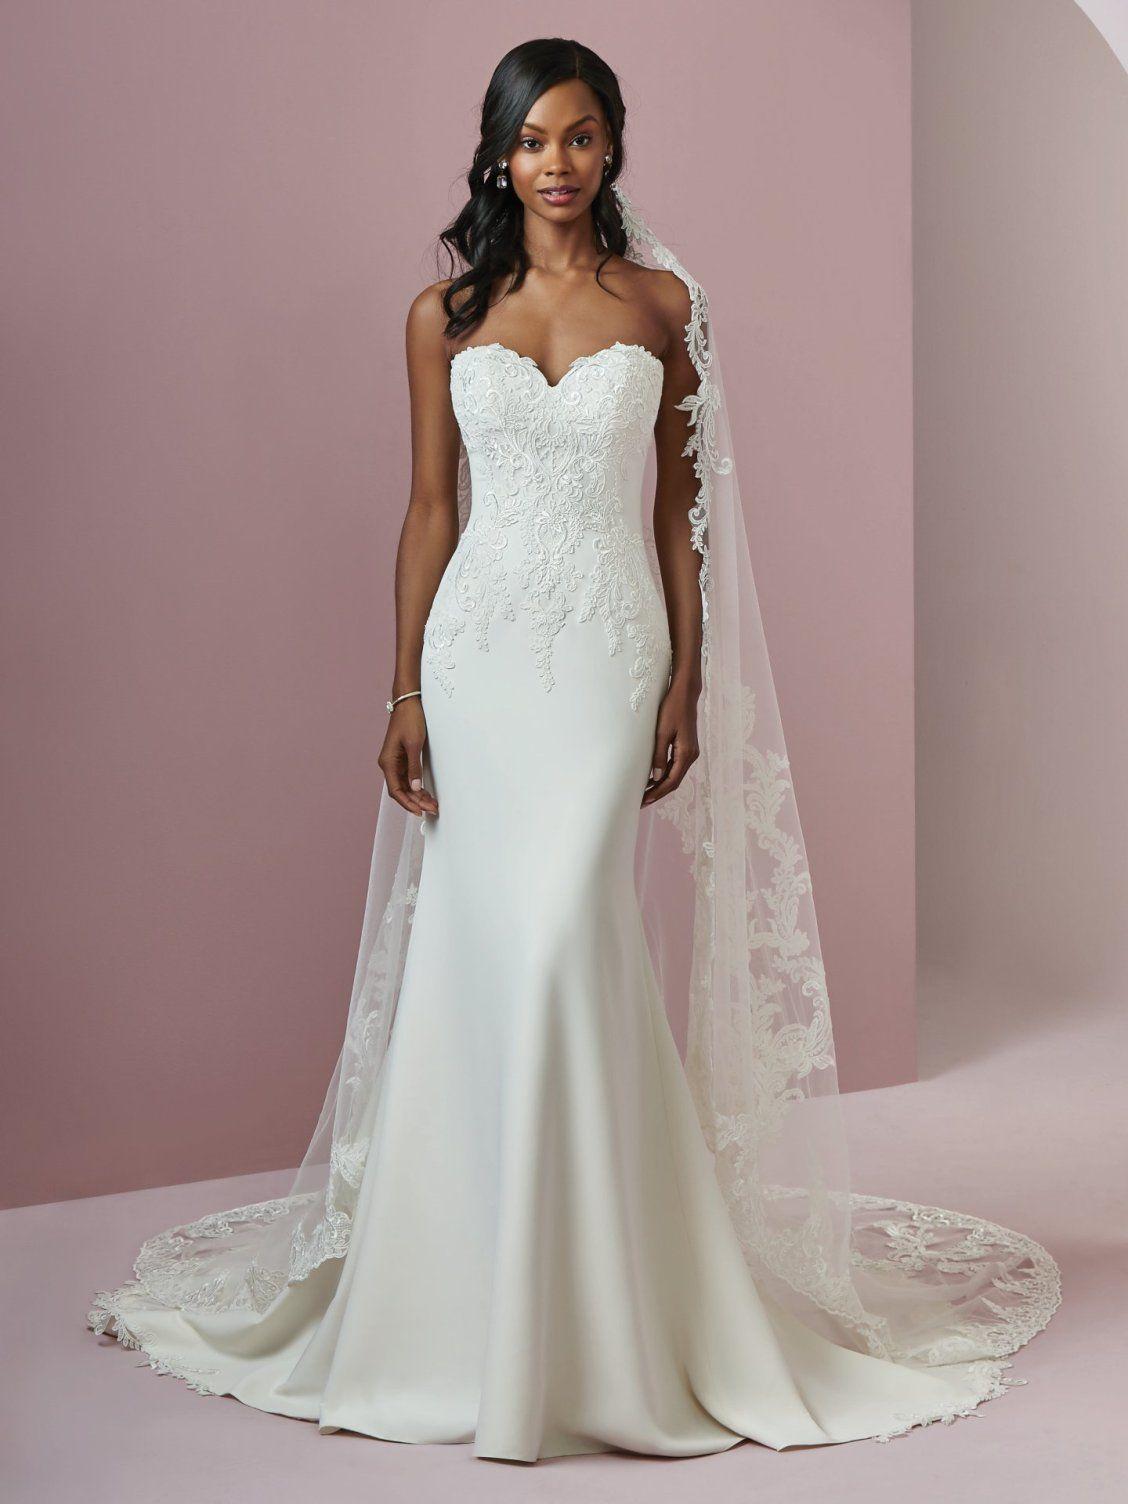 Billie By Rebecca Ingram Wedding Dresses And Accessories Wedding Dresses Satin Wedding Dresses Short Wedding Dress [ 1504 x 1128 Pixel ]